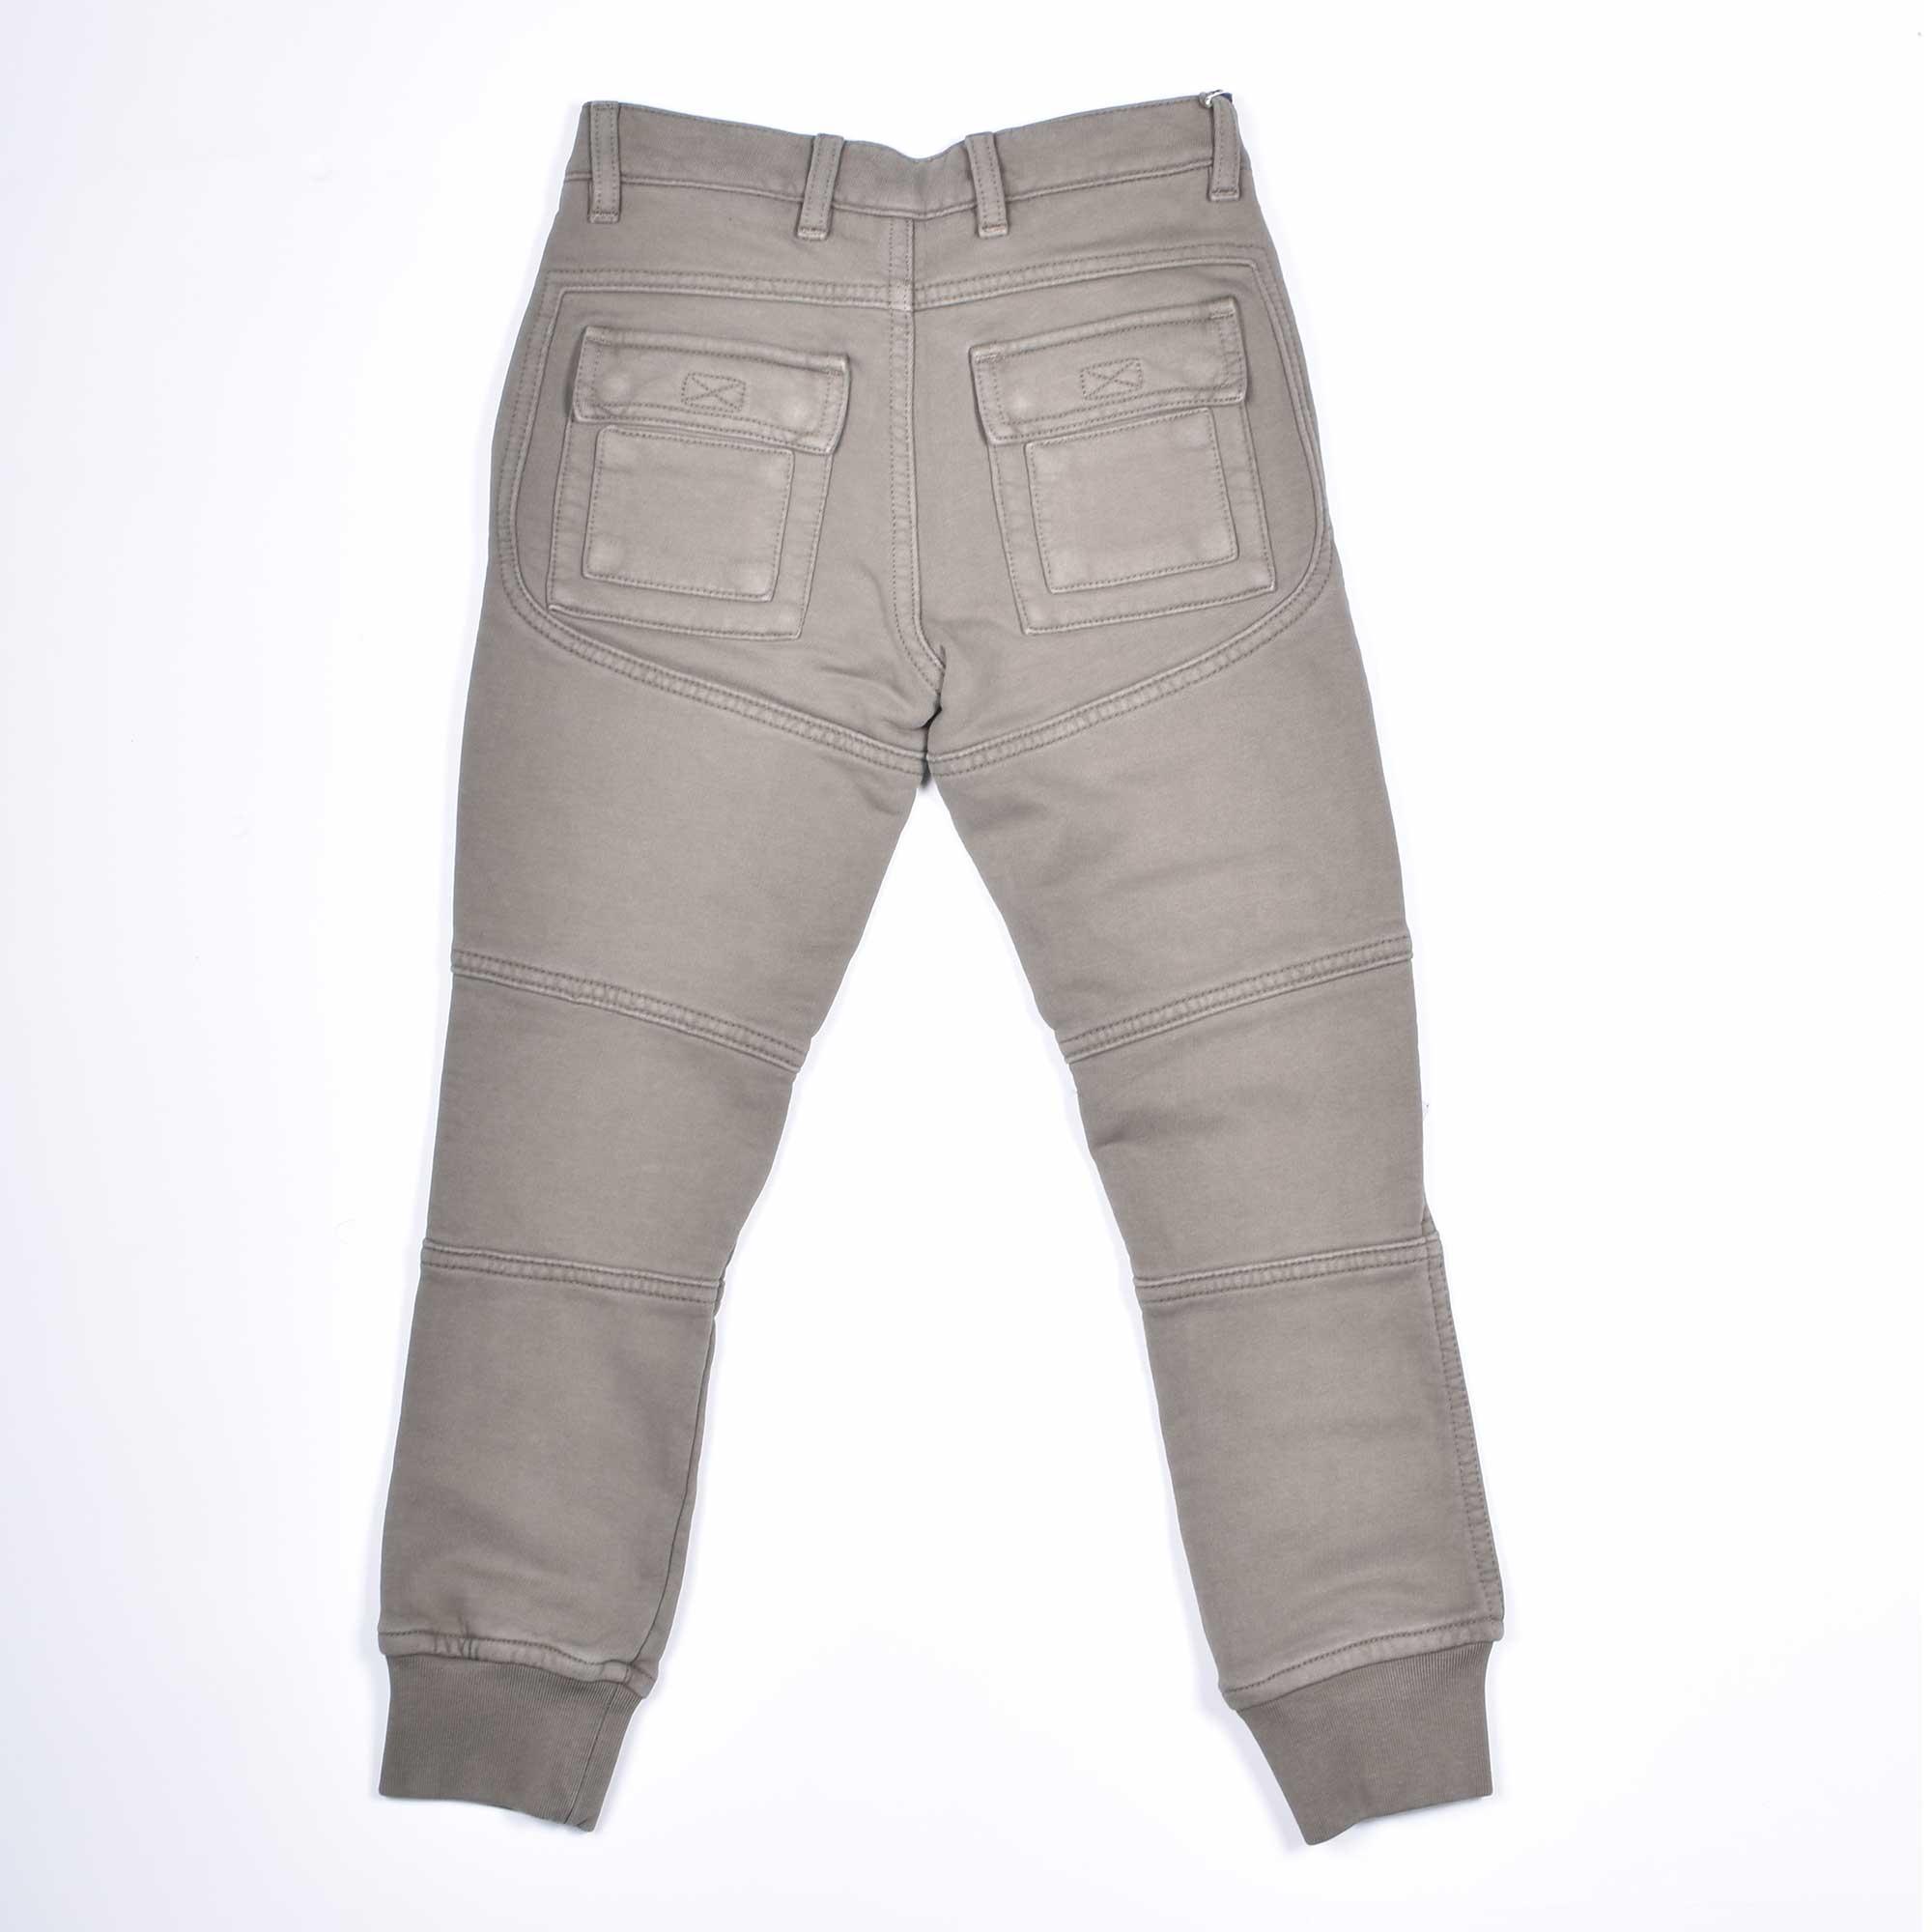 Pantalone felpa anti g - Verde chiaro